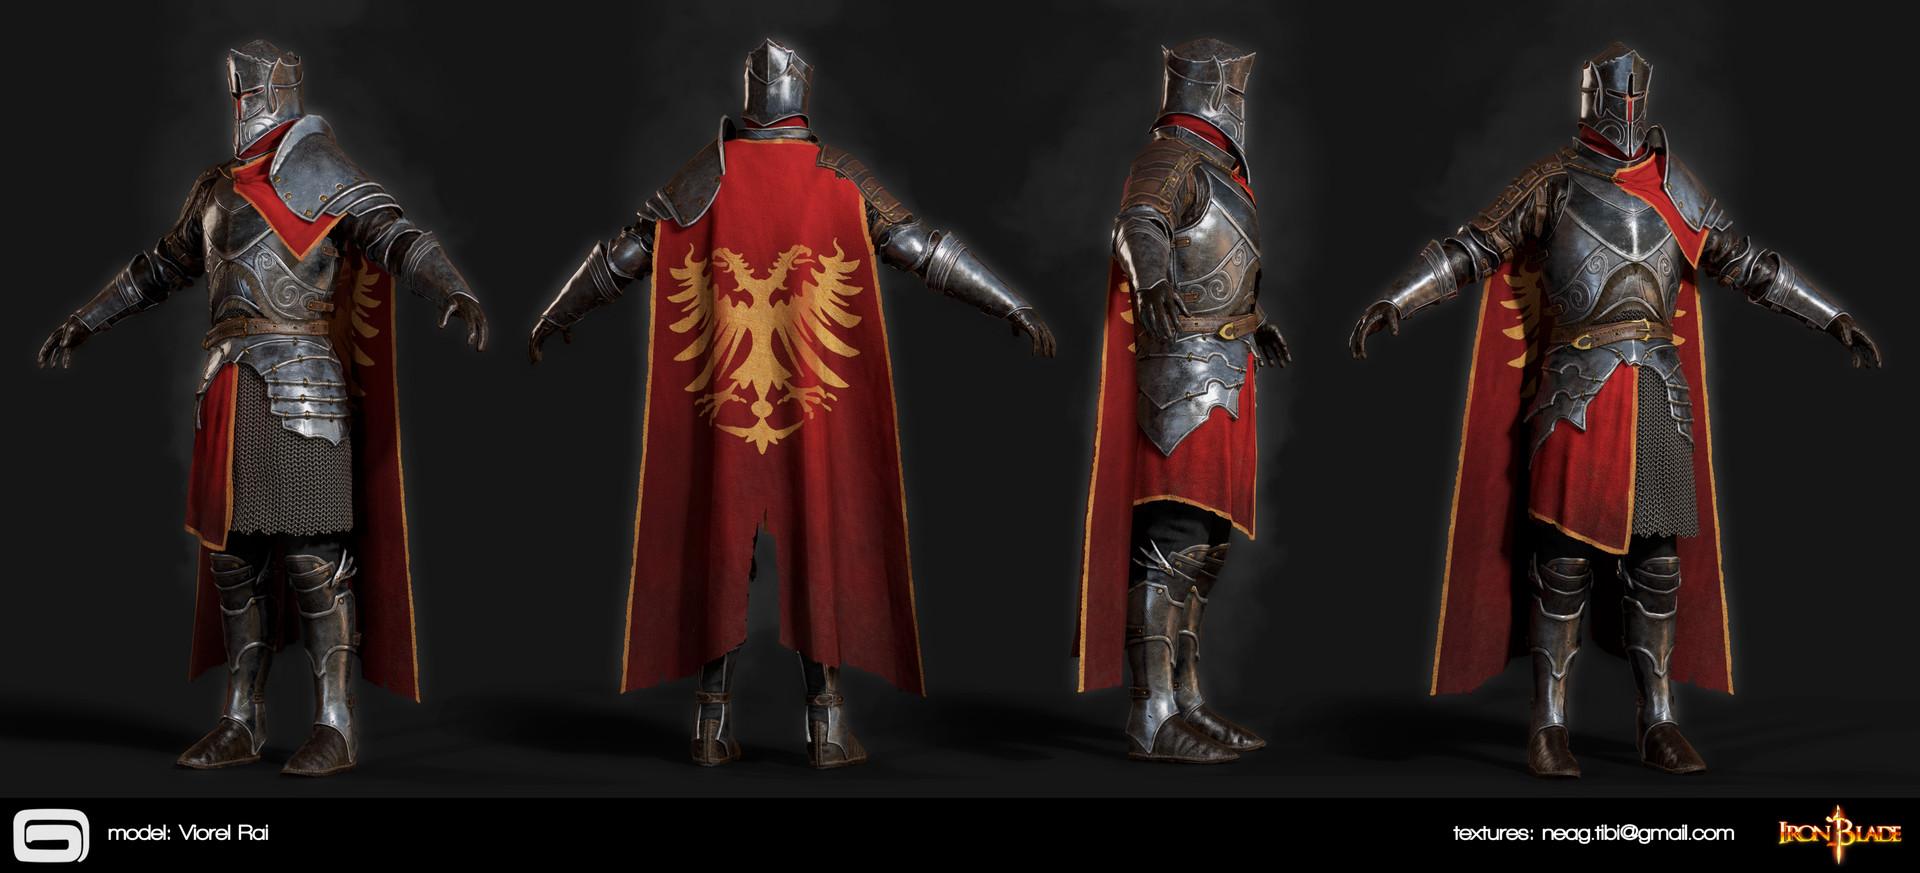 Tibi neag tibi neag iron blade mc armor 08b2